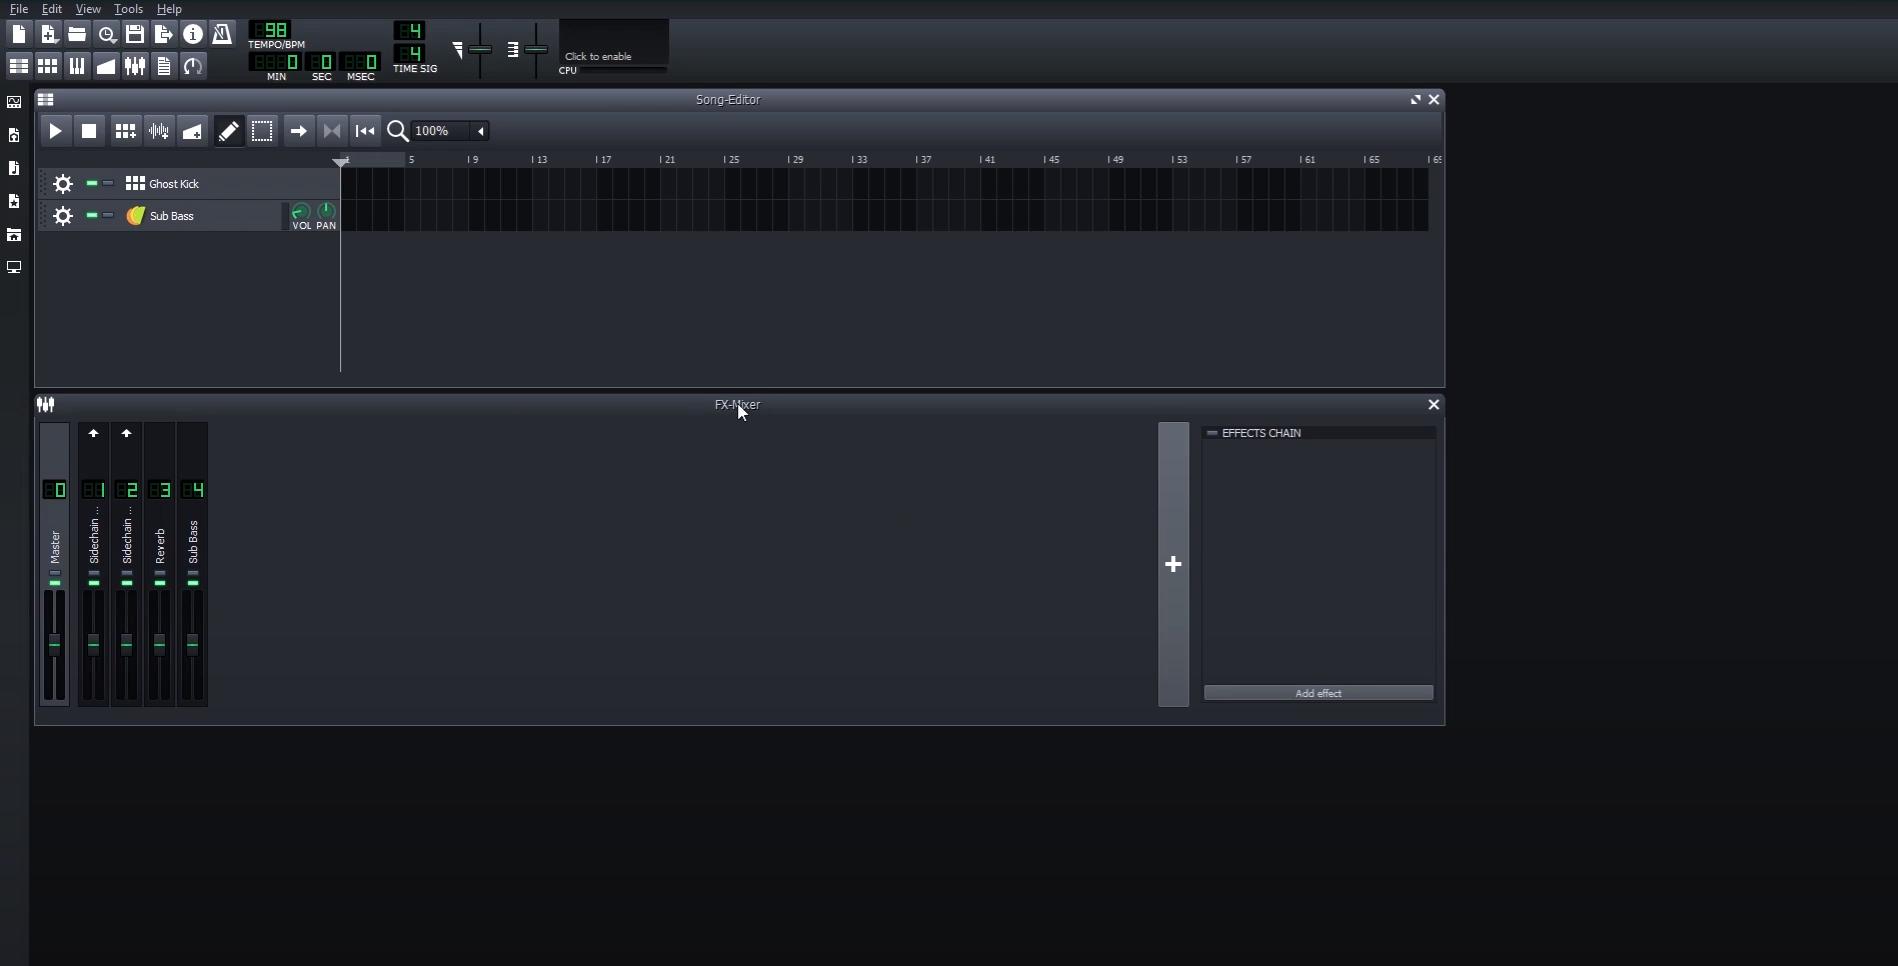 LMMS main interface